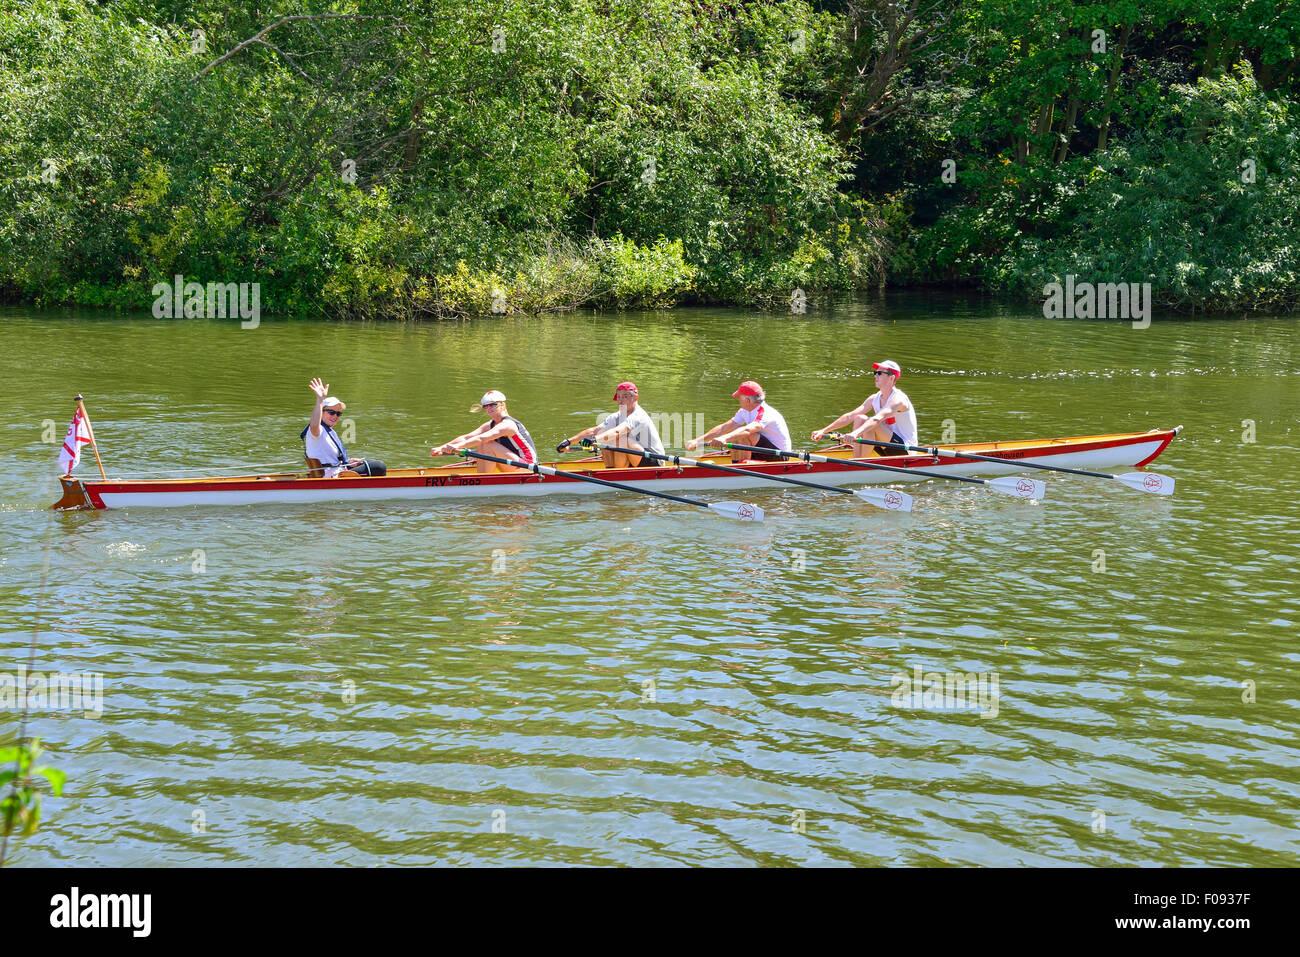 Rowing boat on River Thames, Runnymede, Surrey, England, United Kingdom - Stock Image